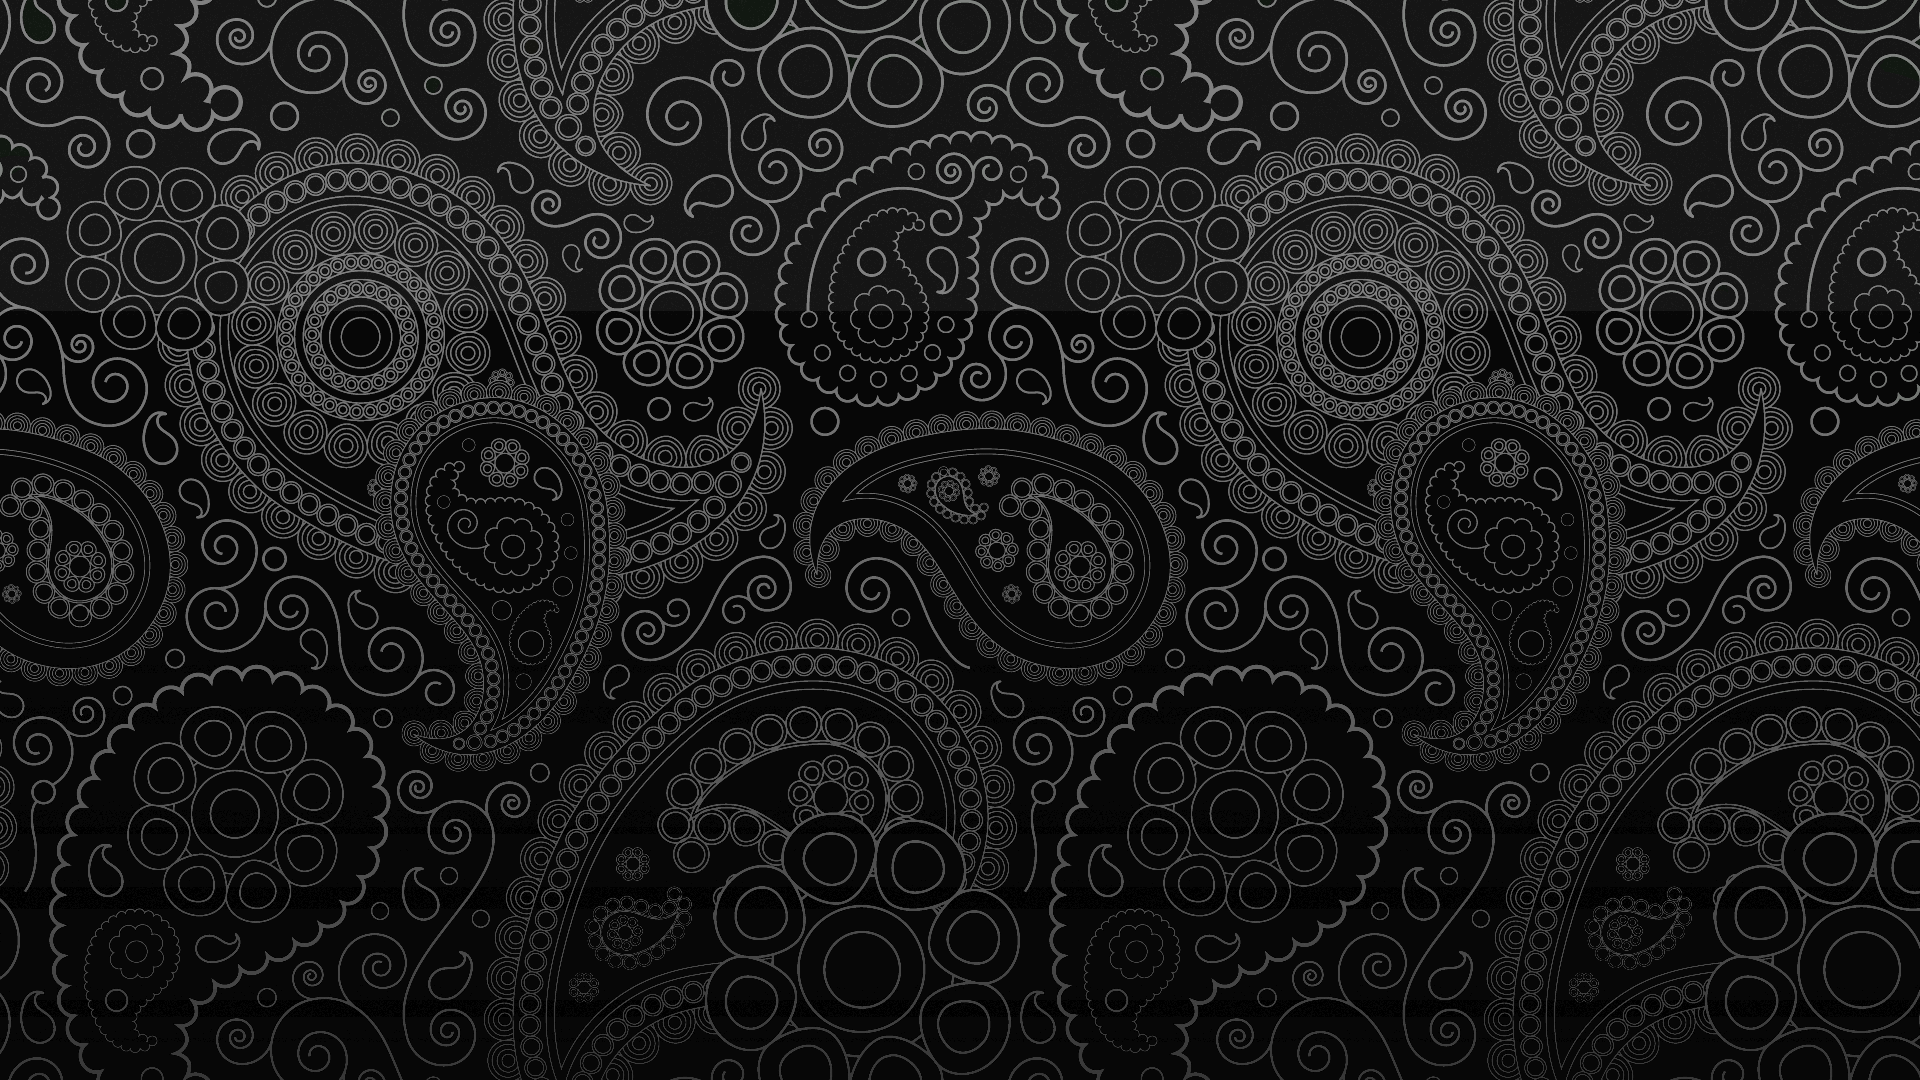 Wallpaper Pattern Hd Background Black Hd Wallpaper Black